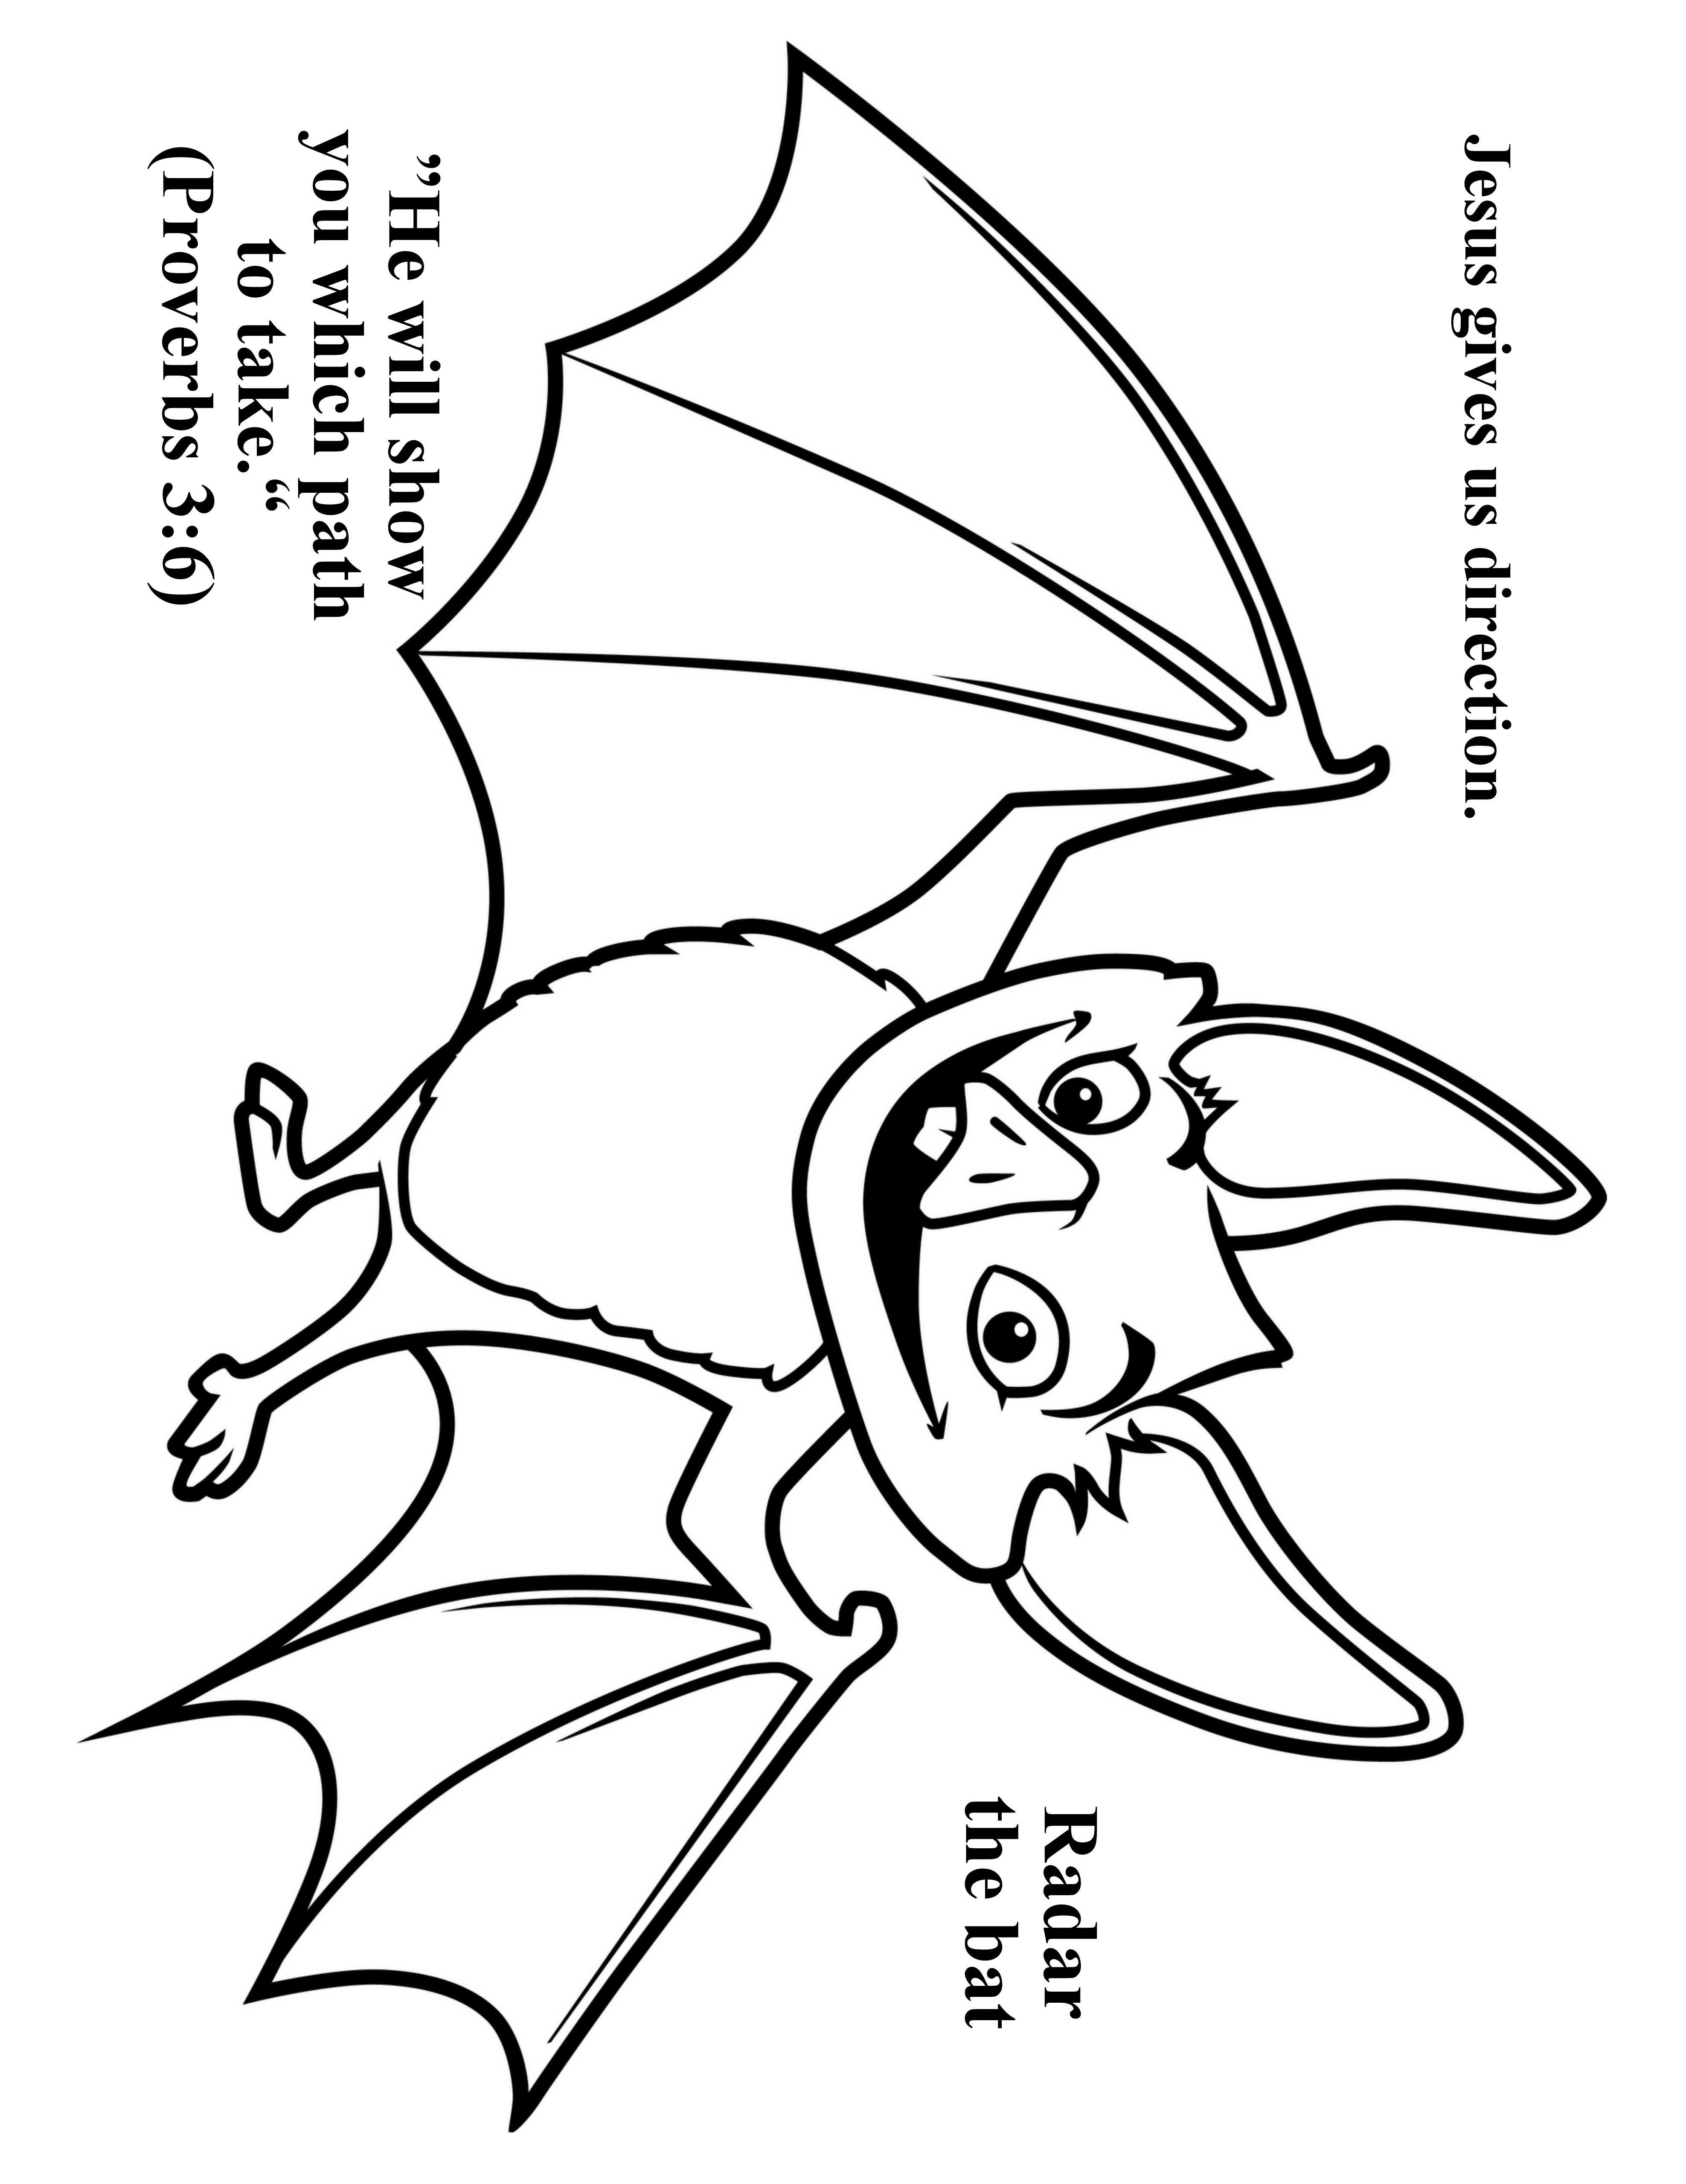 Cave Quest Day 3 preschool coloring page Radar the Bat. | EBV2018 ...